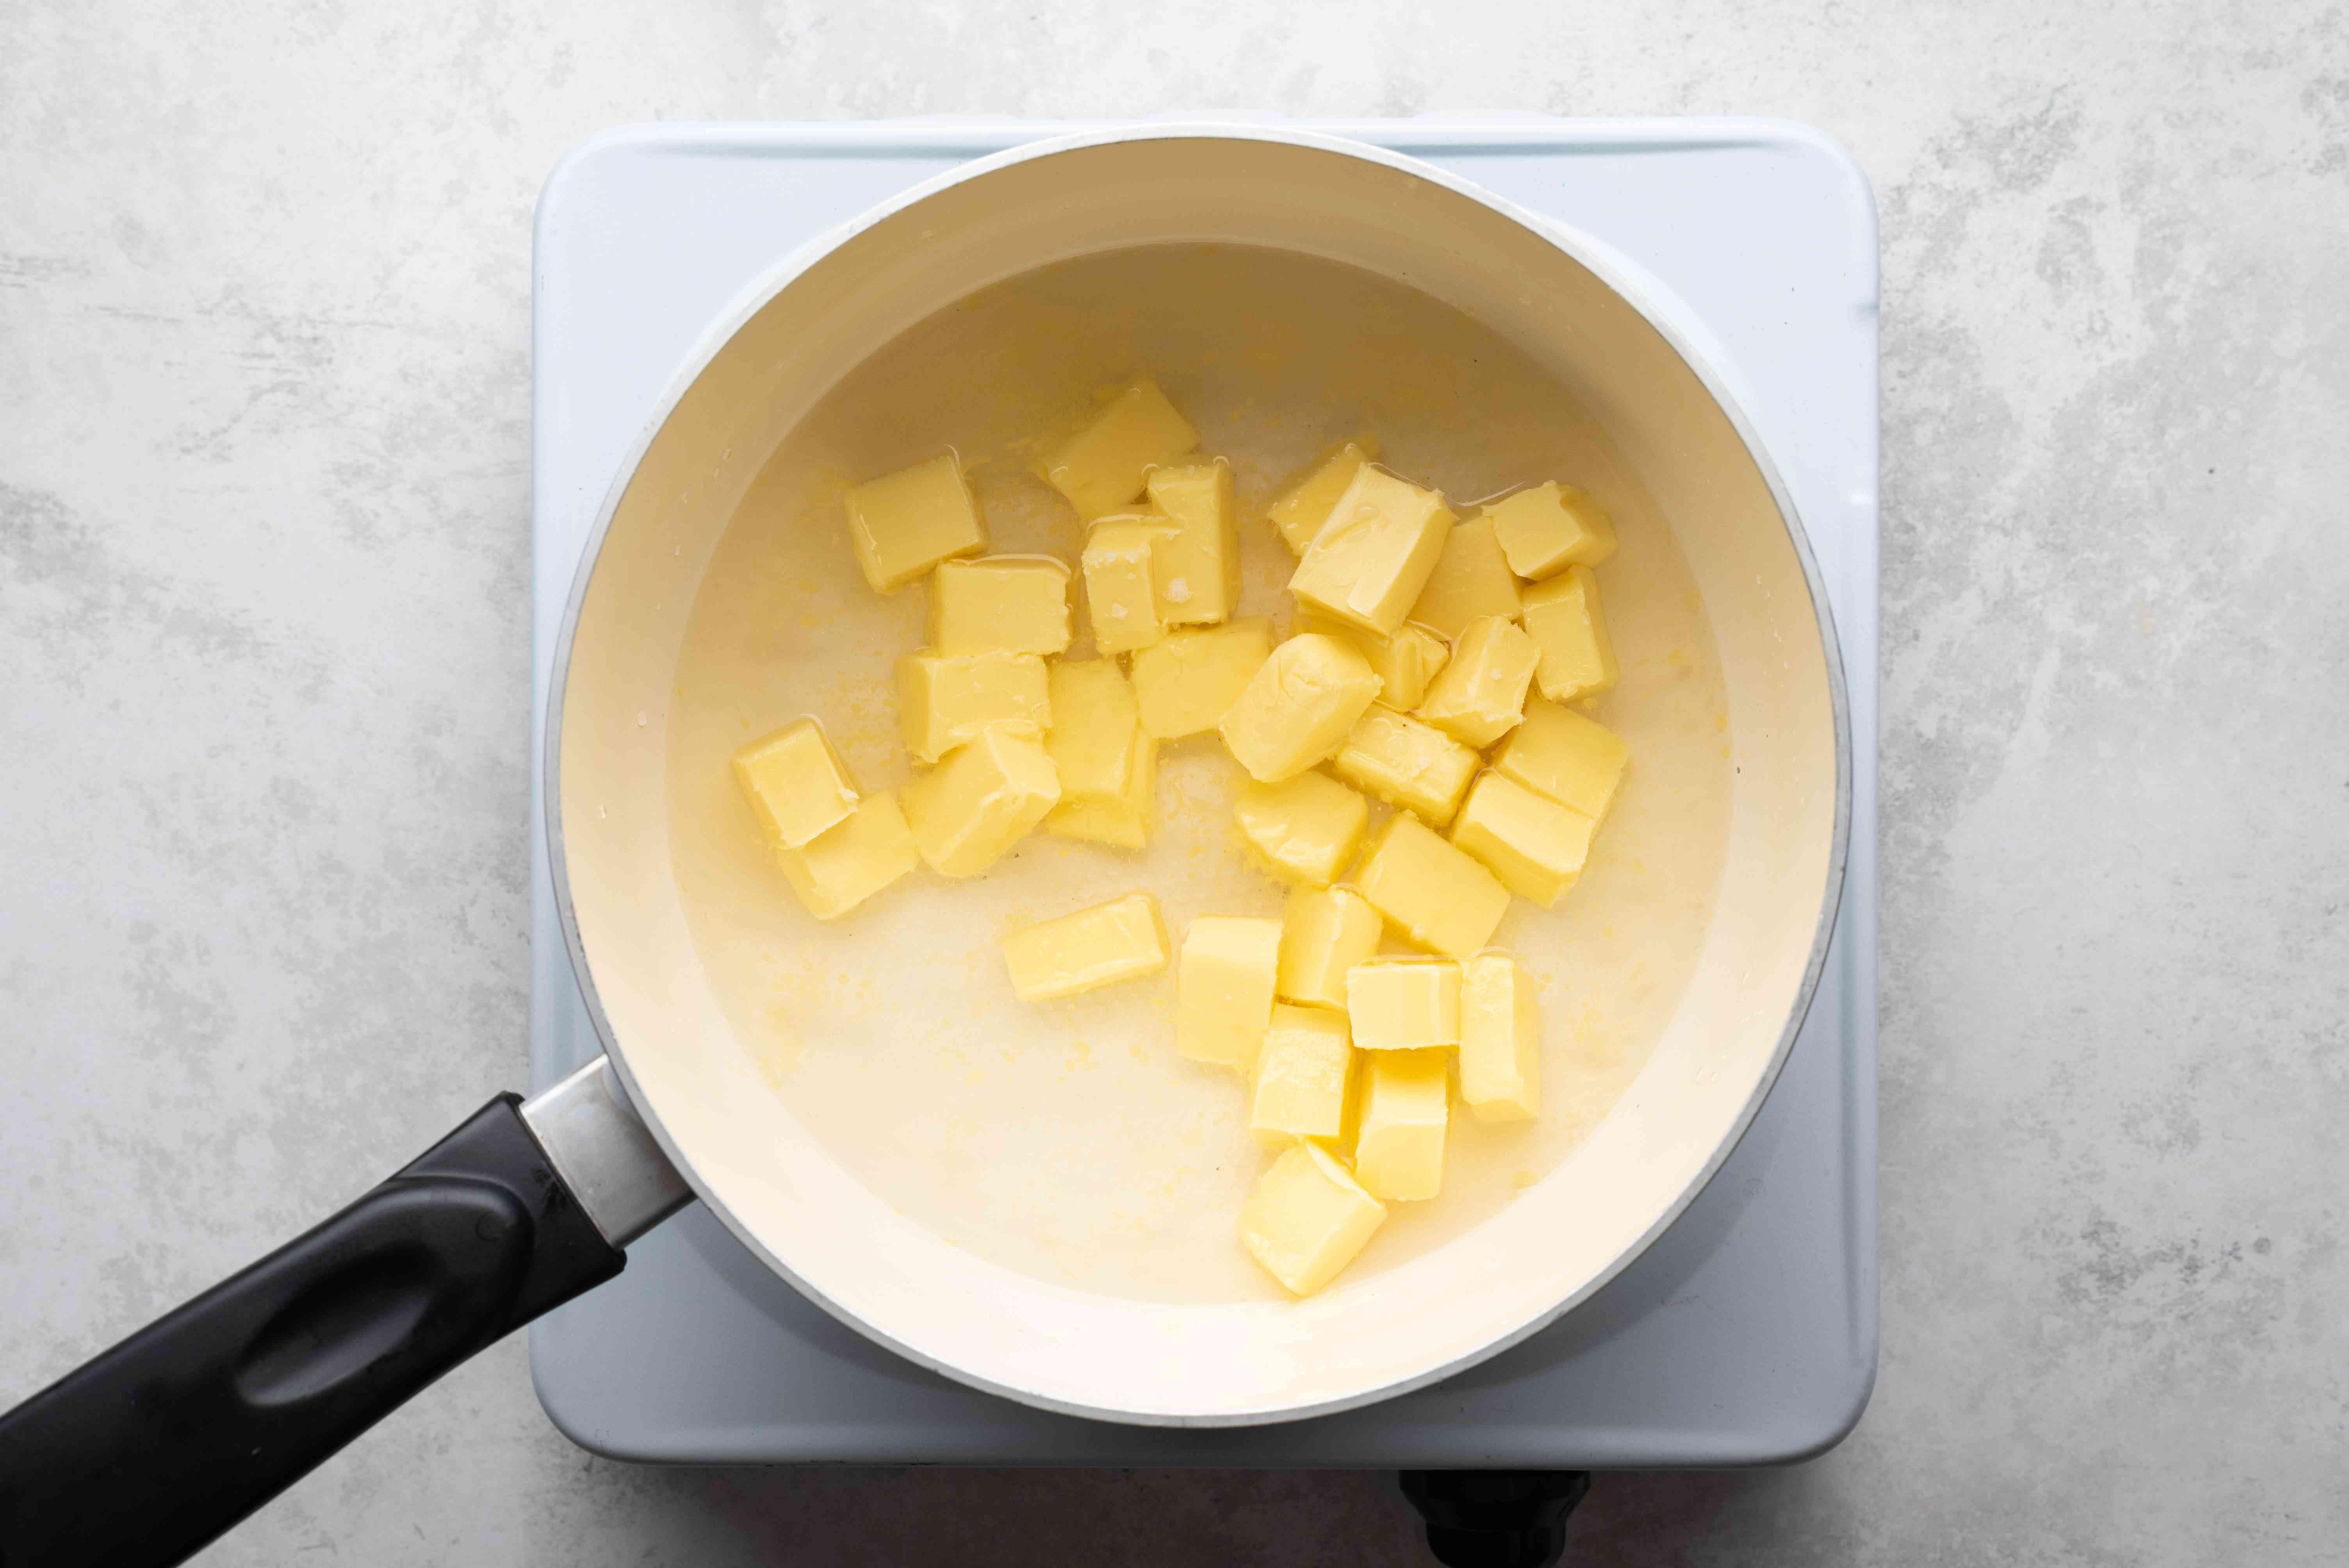 water, butter and salt in a saucepan